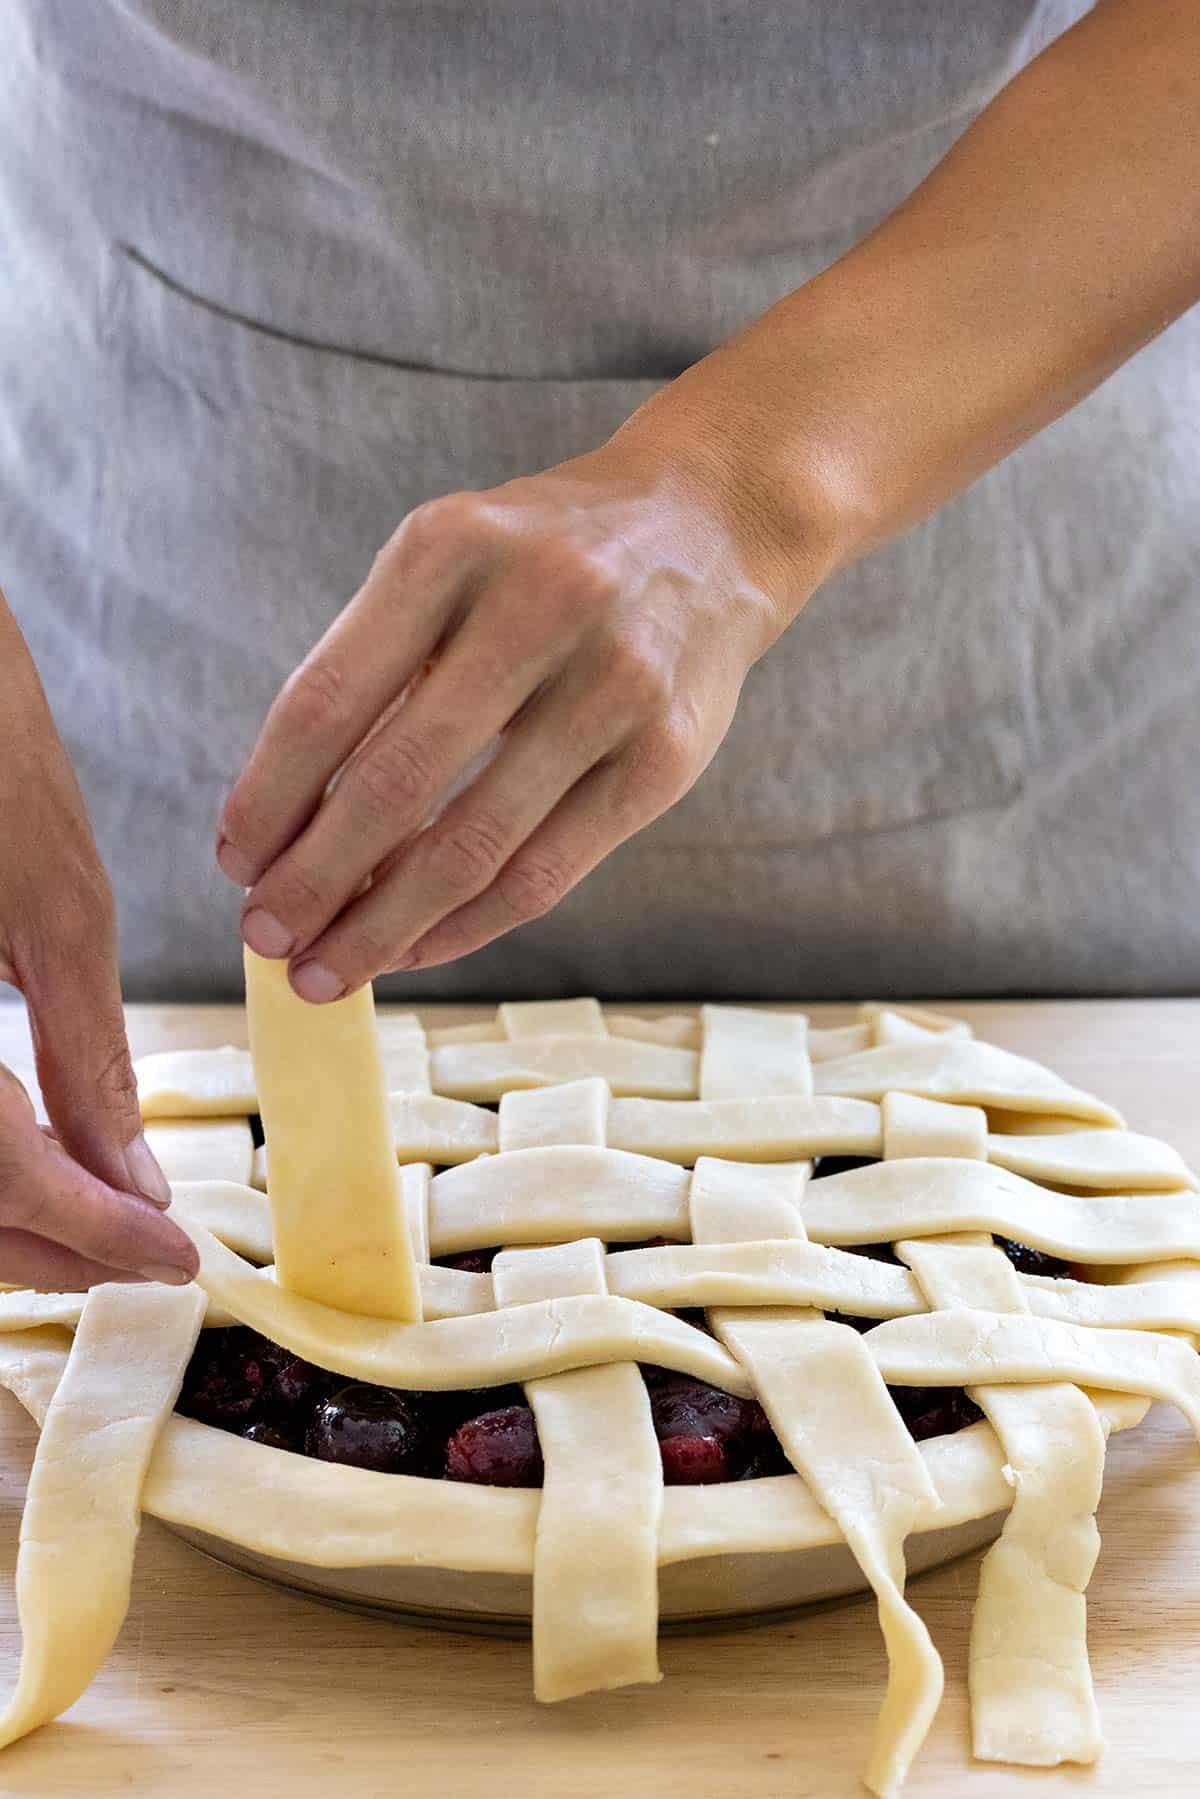 weaving dough to make a lattice crust